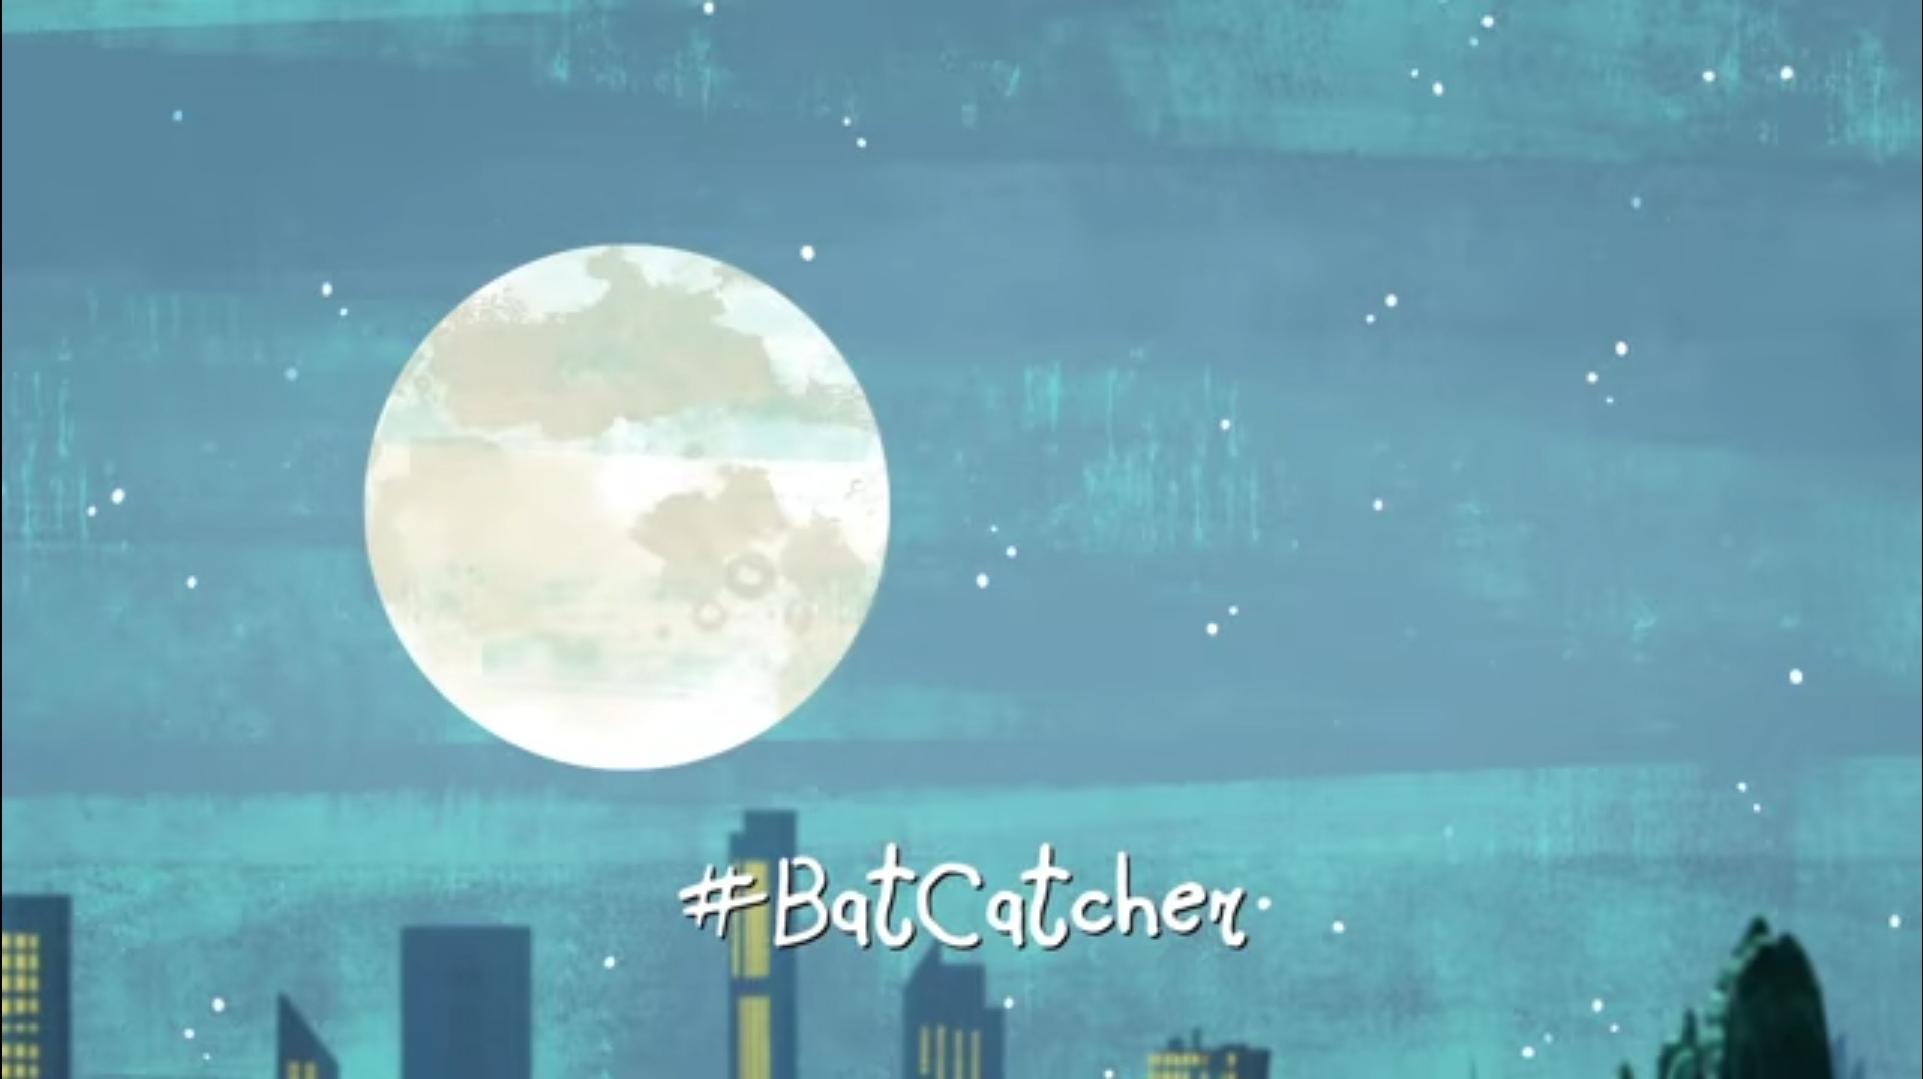 Bat Catcher